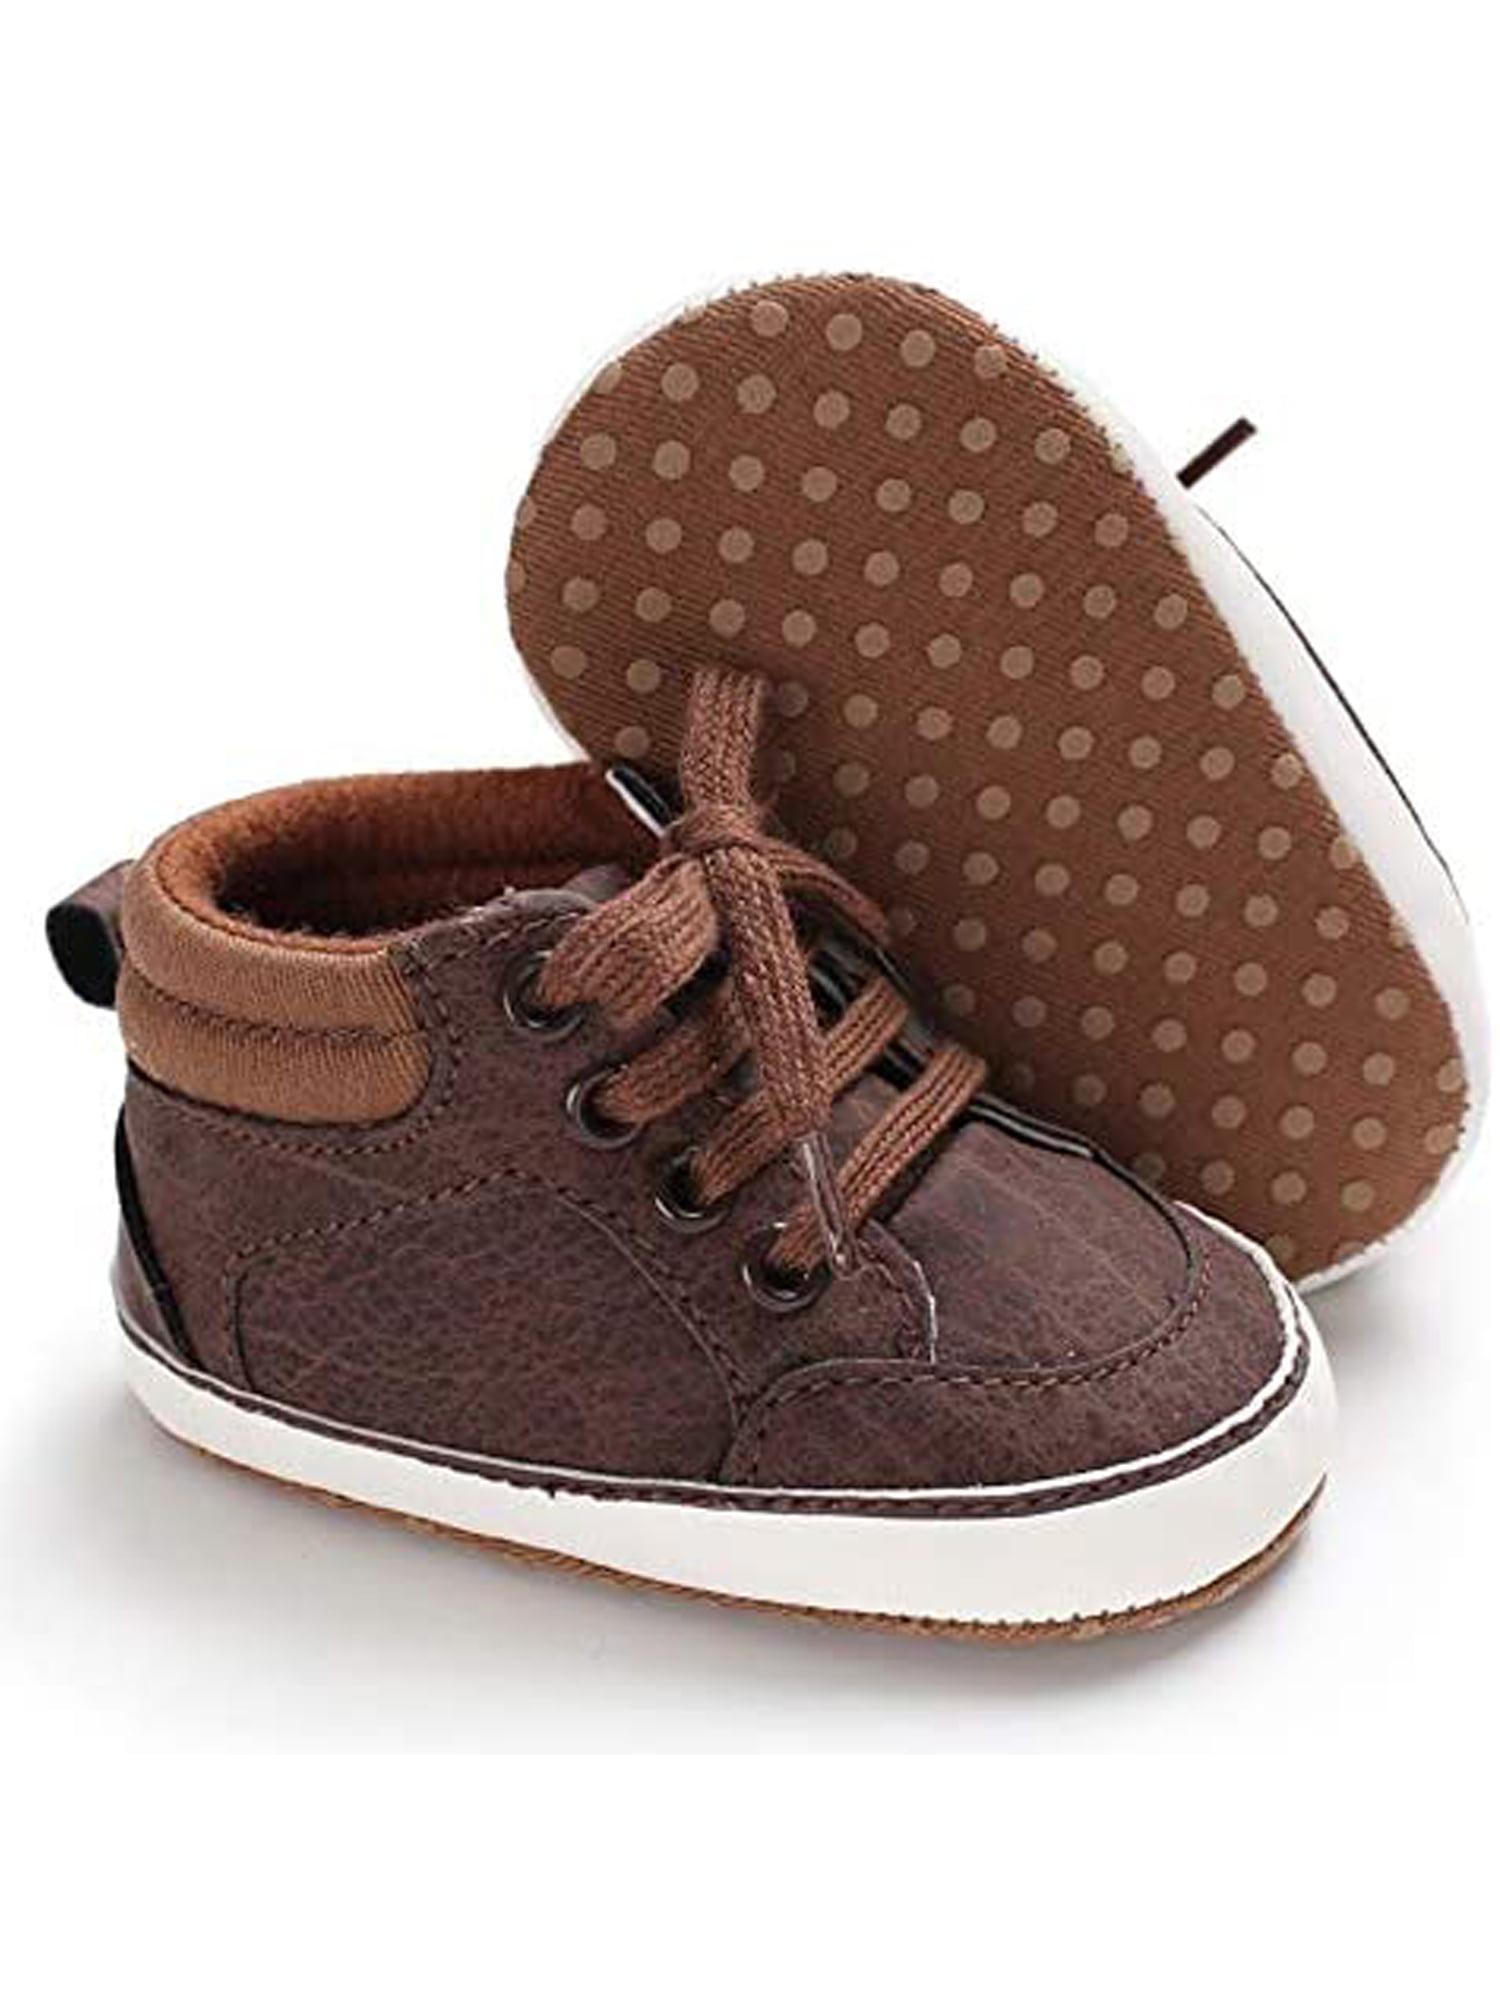 Frecoccialo - Baby Boy Shoes Newborn